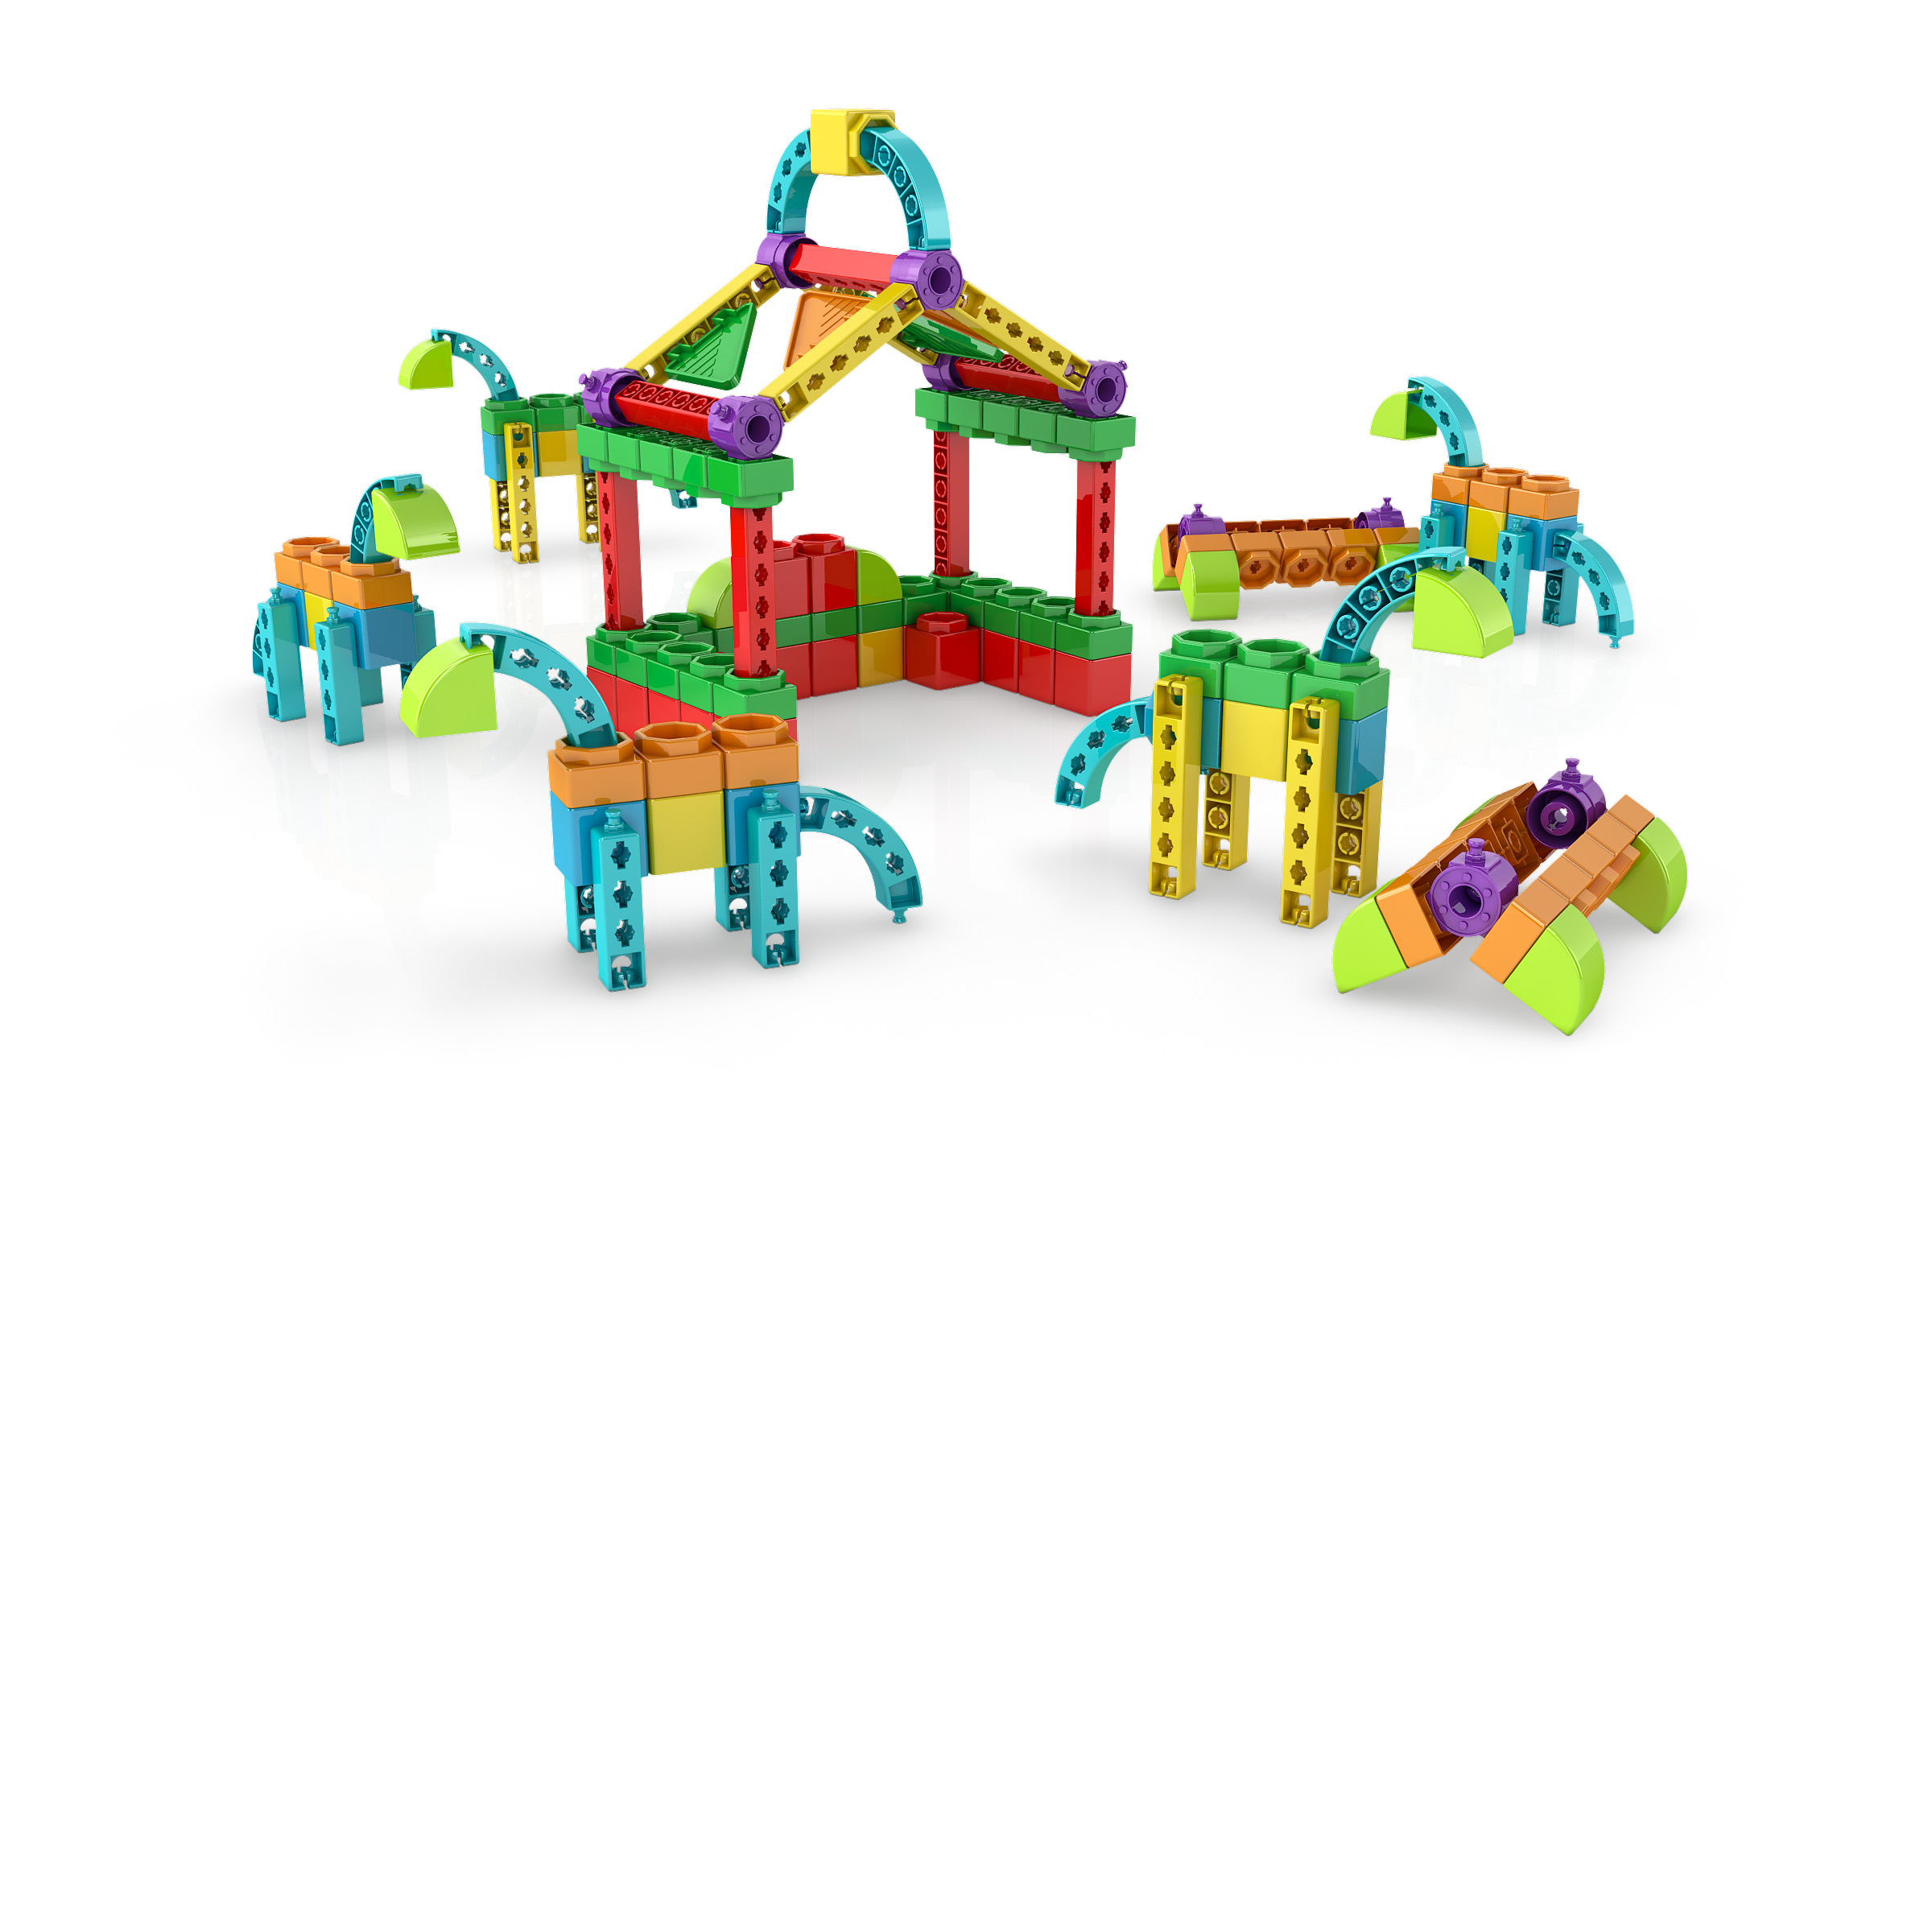 , farm 1, משחקי חשיבה לילדים engino, משחקים לגיל הרך playgro, משחק הרכבות אנג'ינו, משחקי רכבות